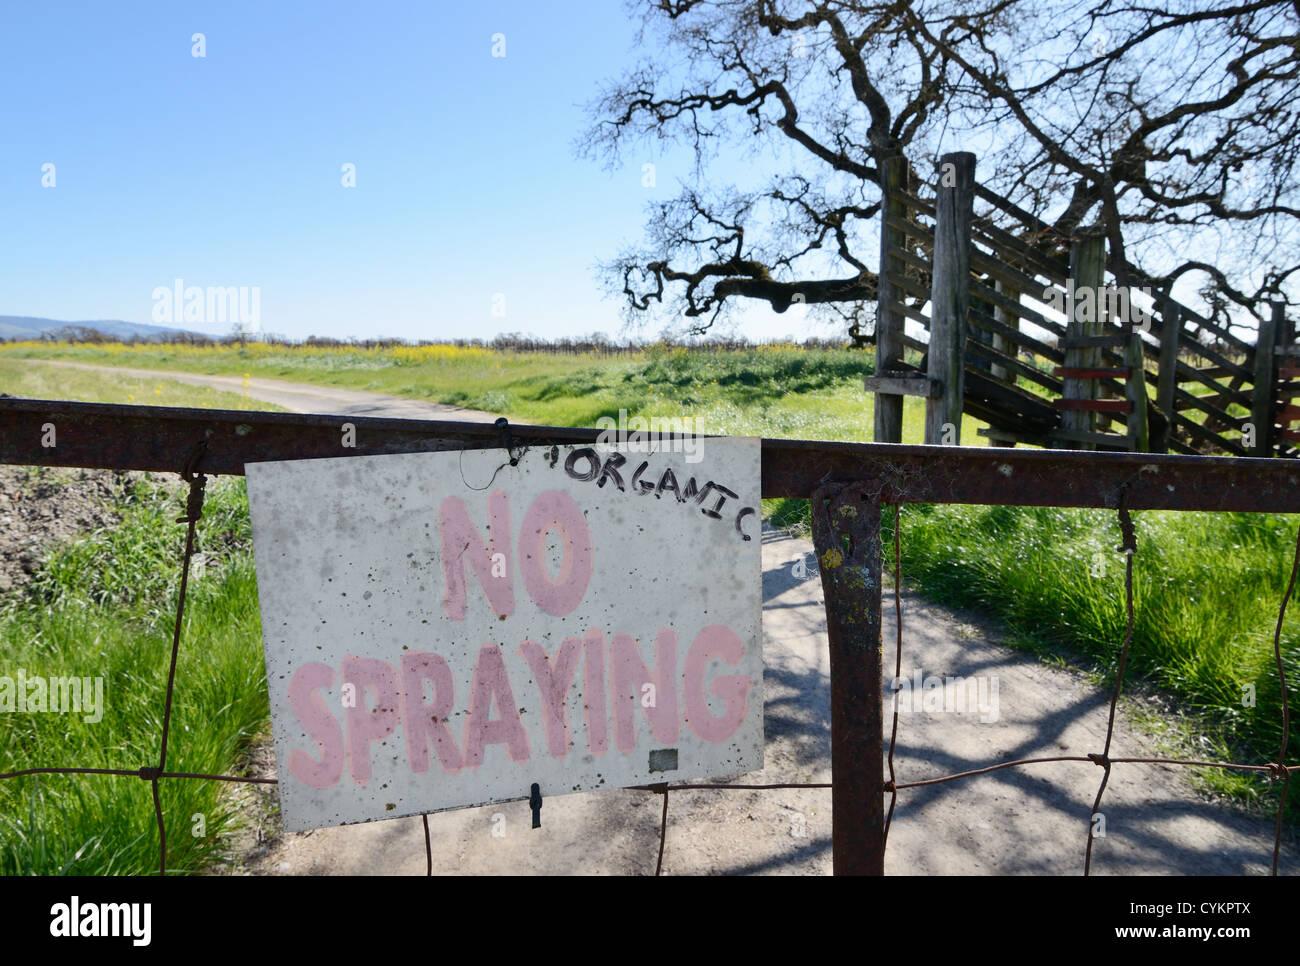 No spraying sign at organic farm Stock Photo